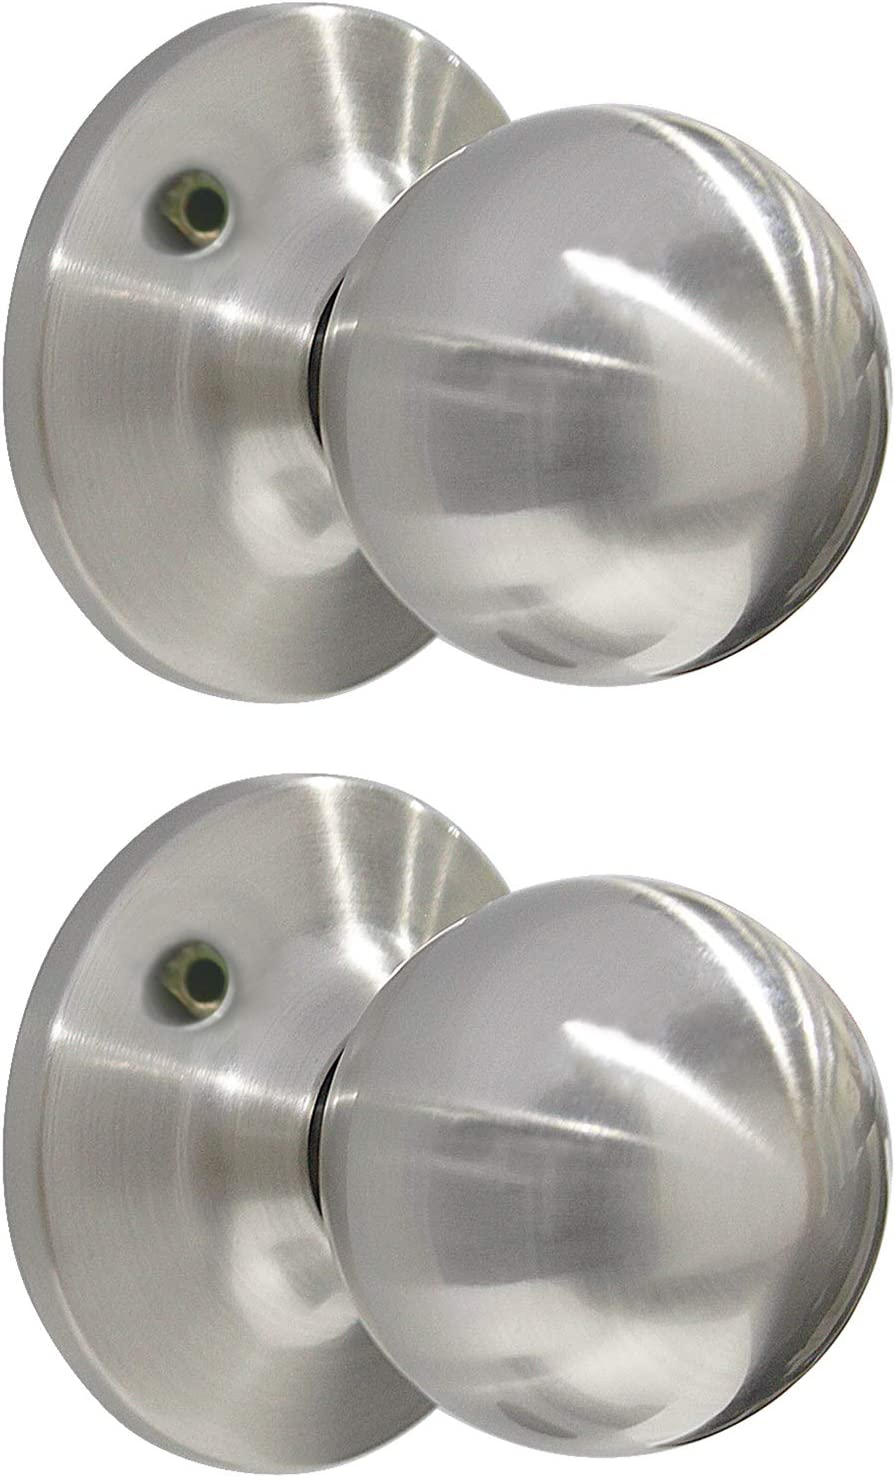 5 Pack Probrico Round Dummy Door Handle On Rose Stainless Steel Interior Door Knob Brushed Nickel Base Diameter 65mm 2-1//2 inch